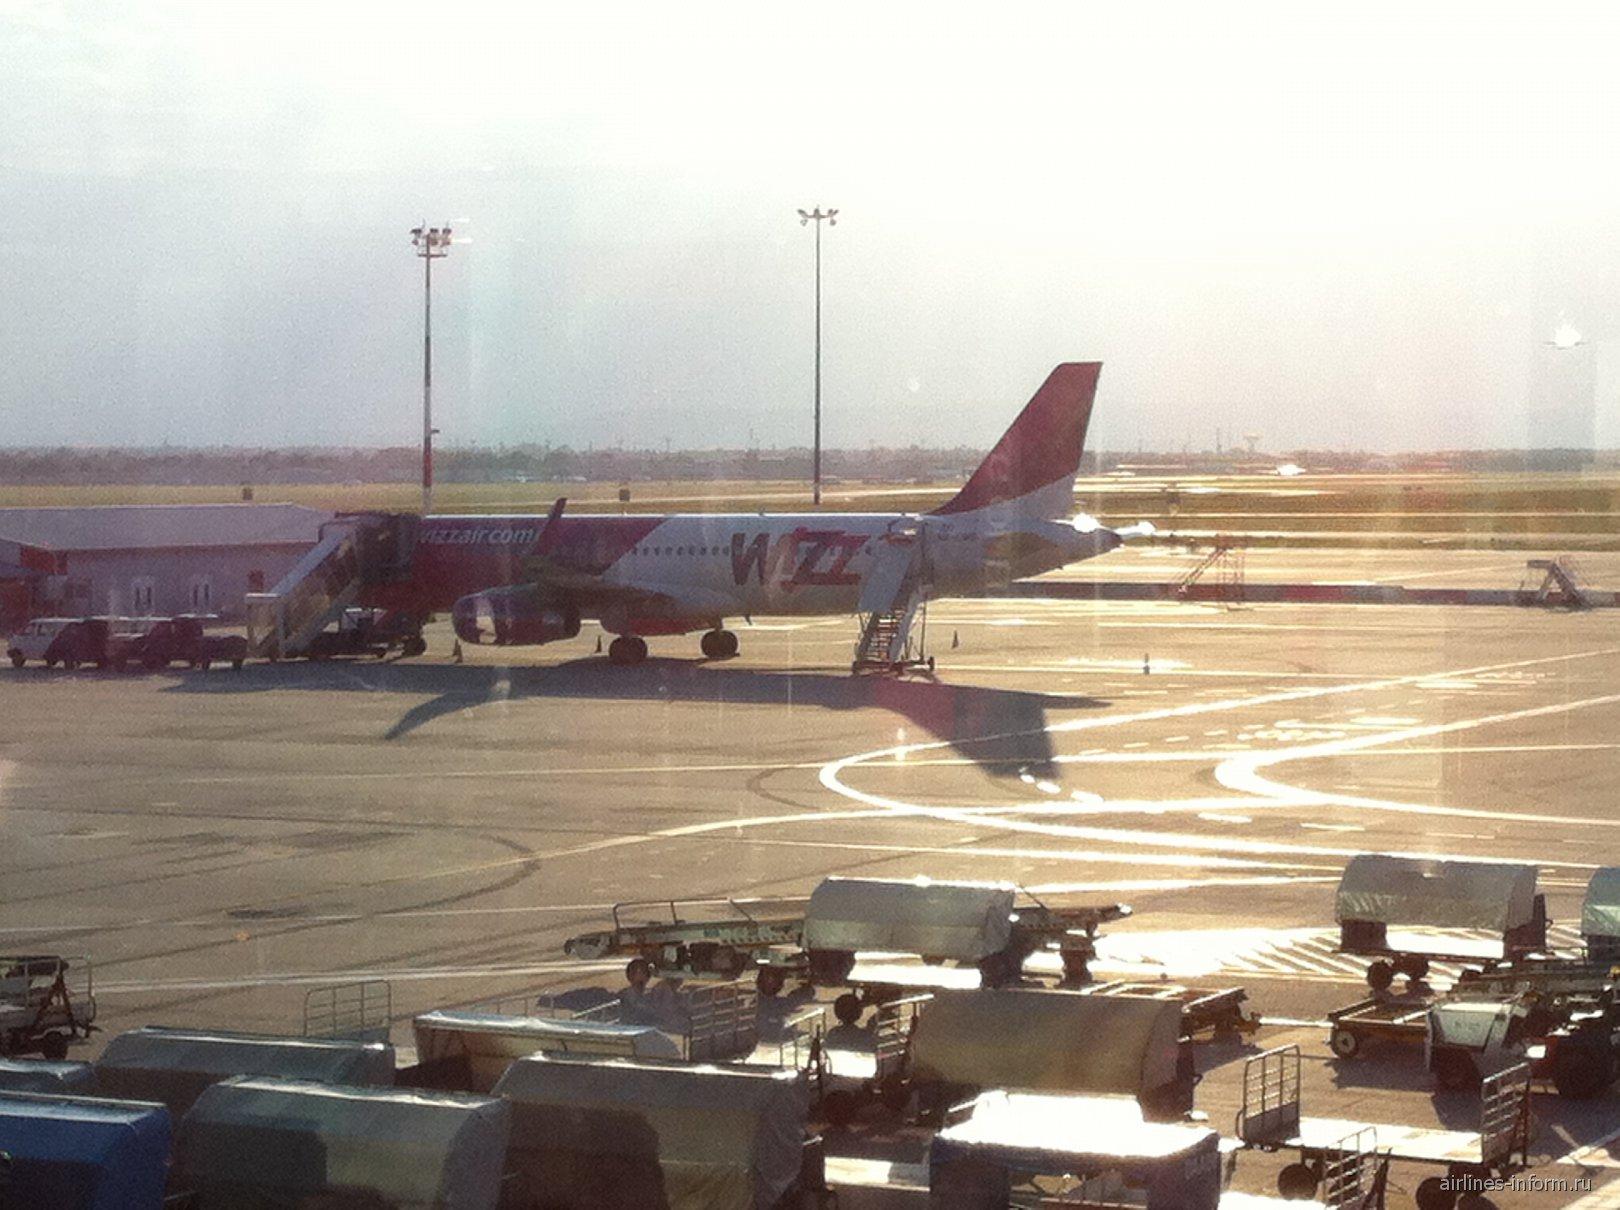 A320 Венгерского лоукостера Wizz Air